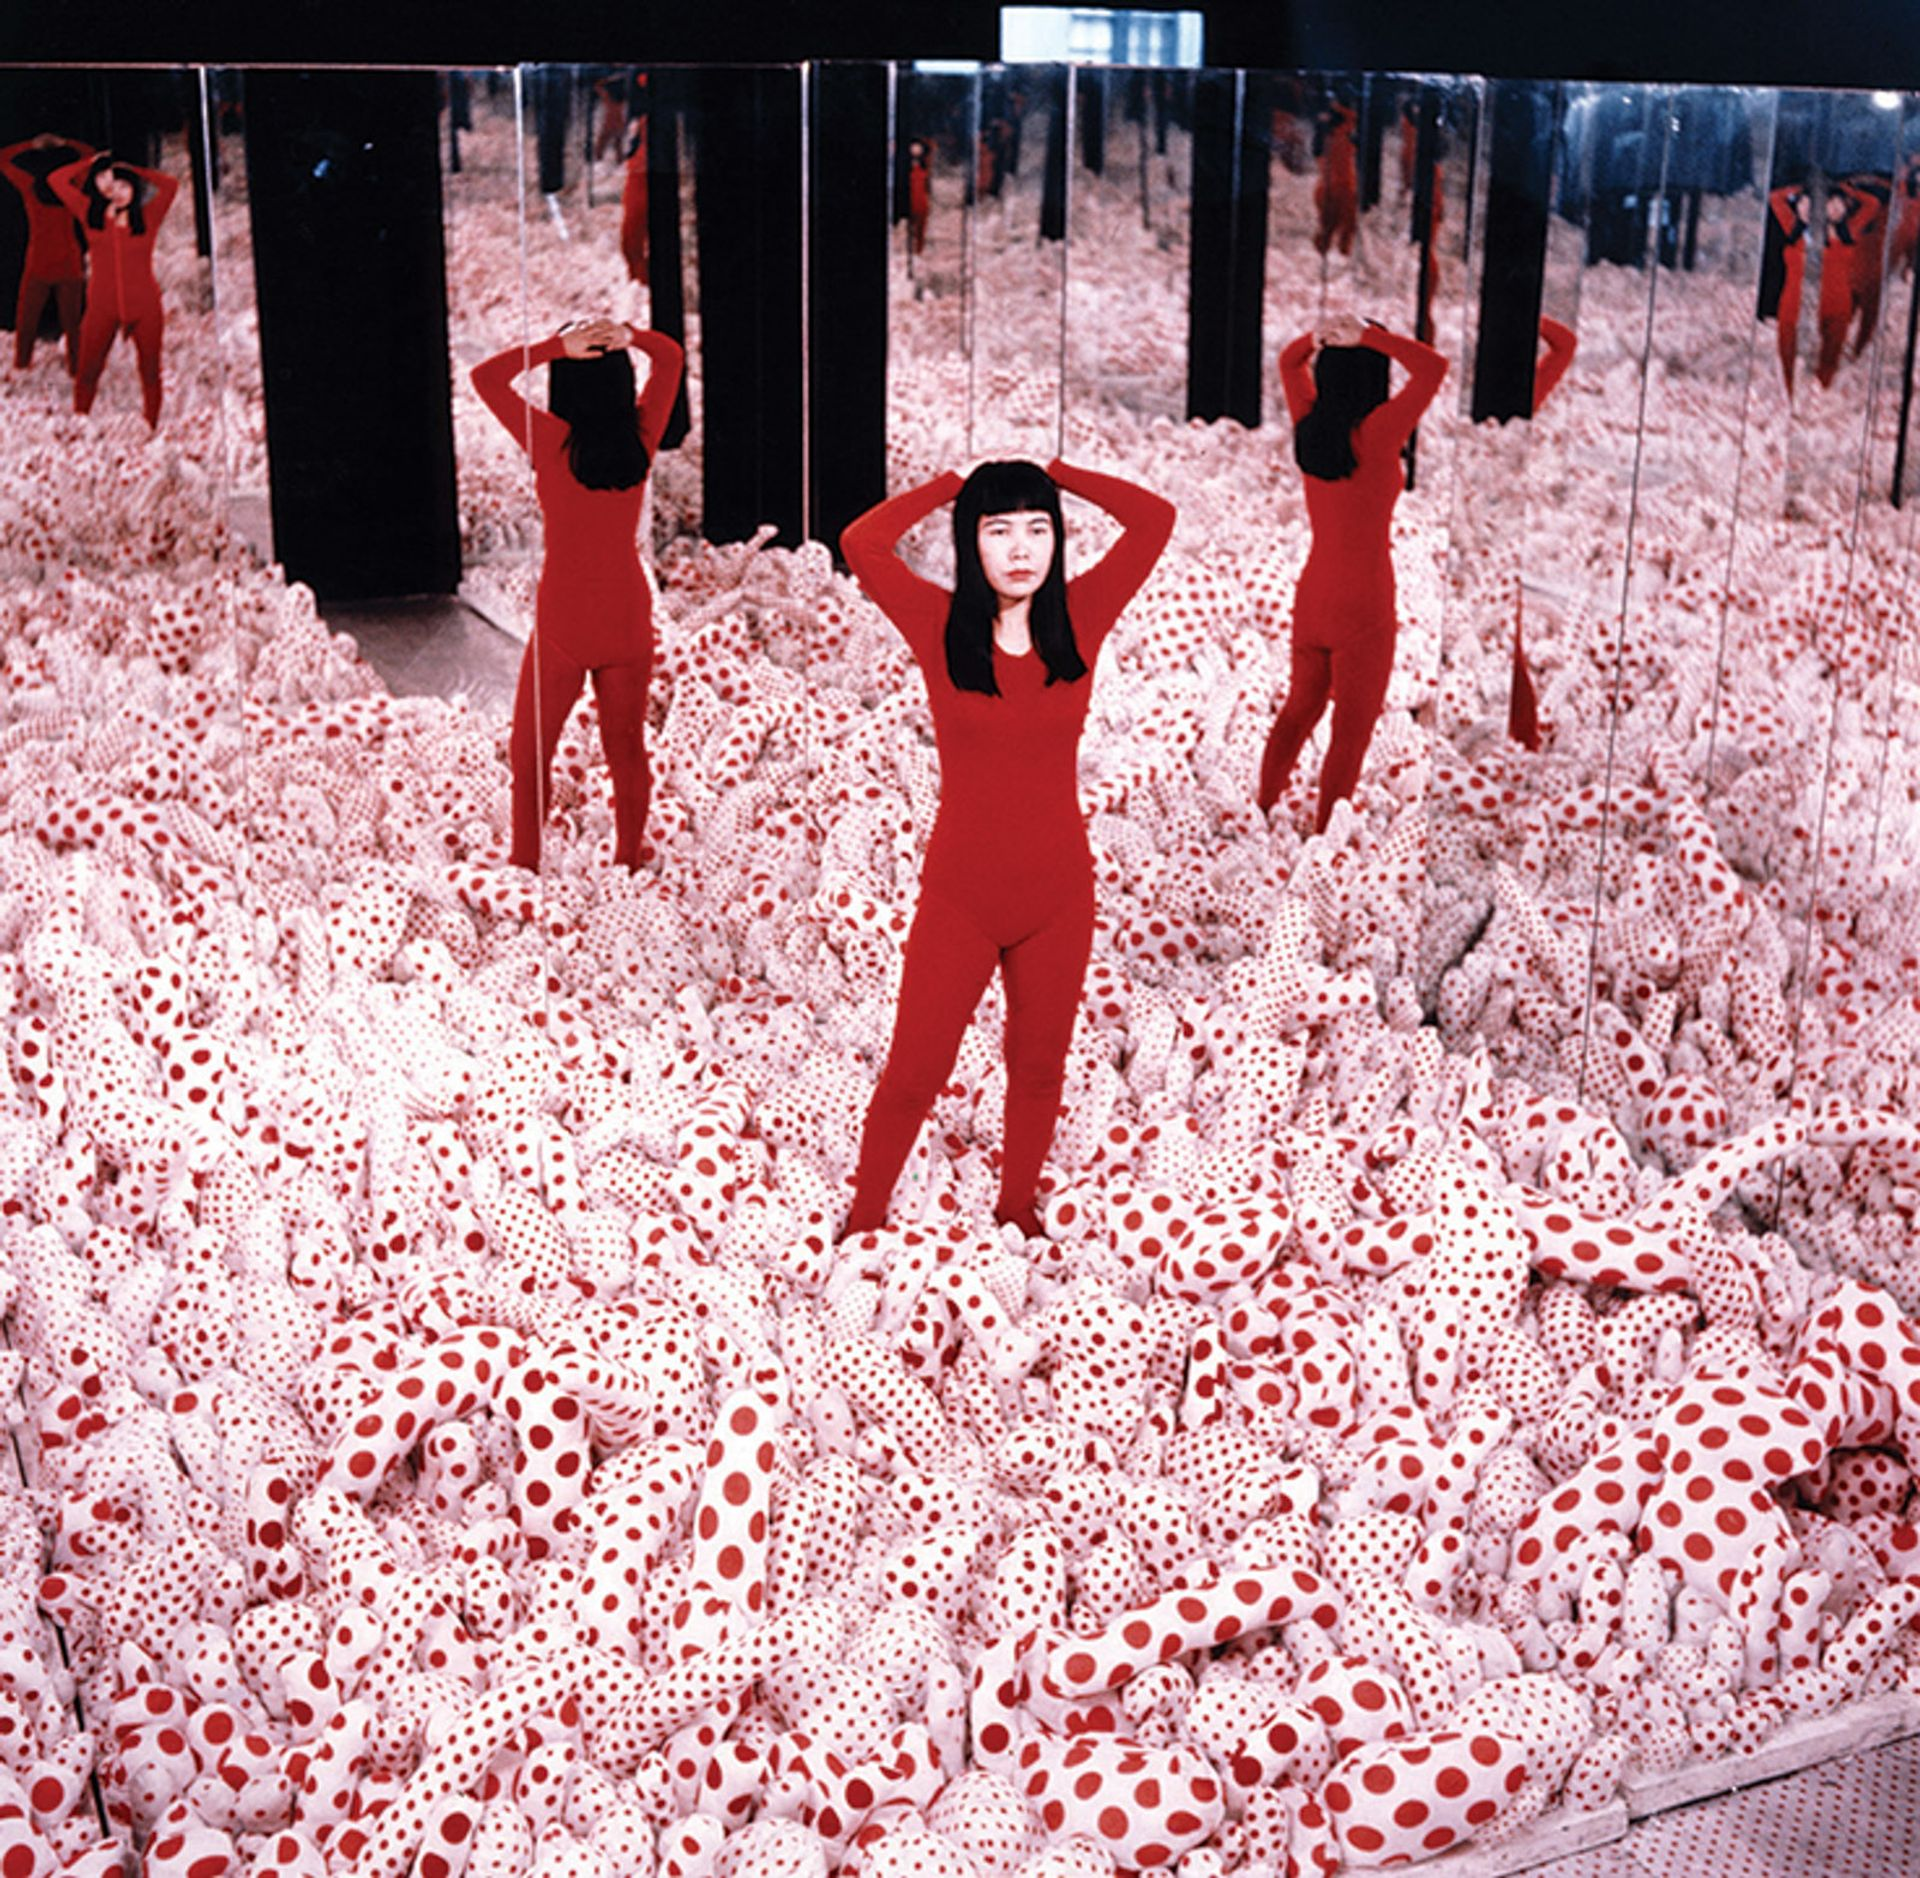 Yayoi Kusama's Infinity Mirror Room – Phalli's Field (1965) © Yayoi Kusama, courtesy of Ota Fine Arts, Victoria Miro, David Zwirner